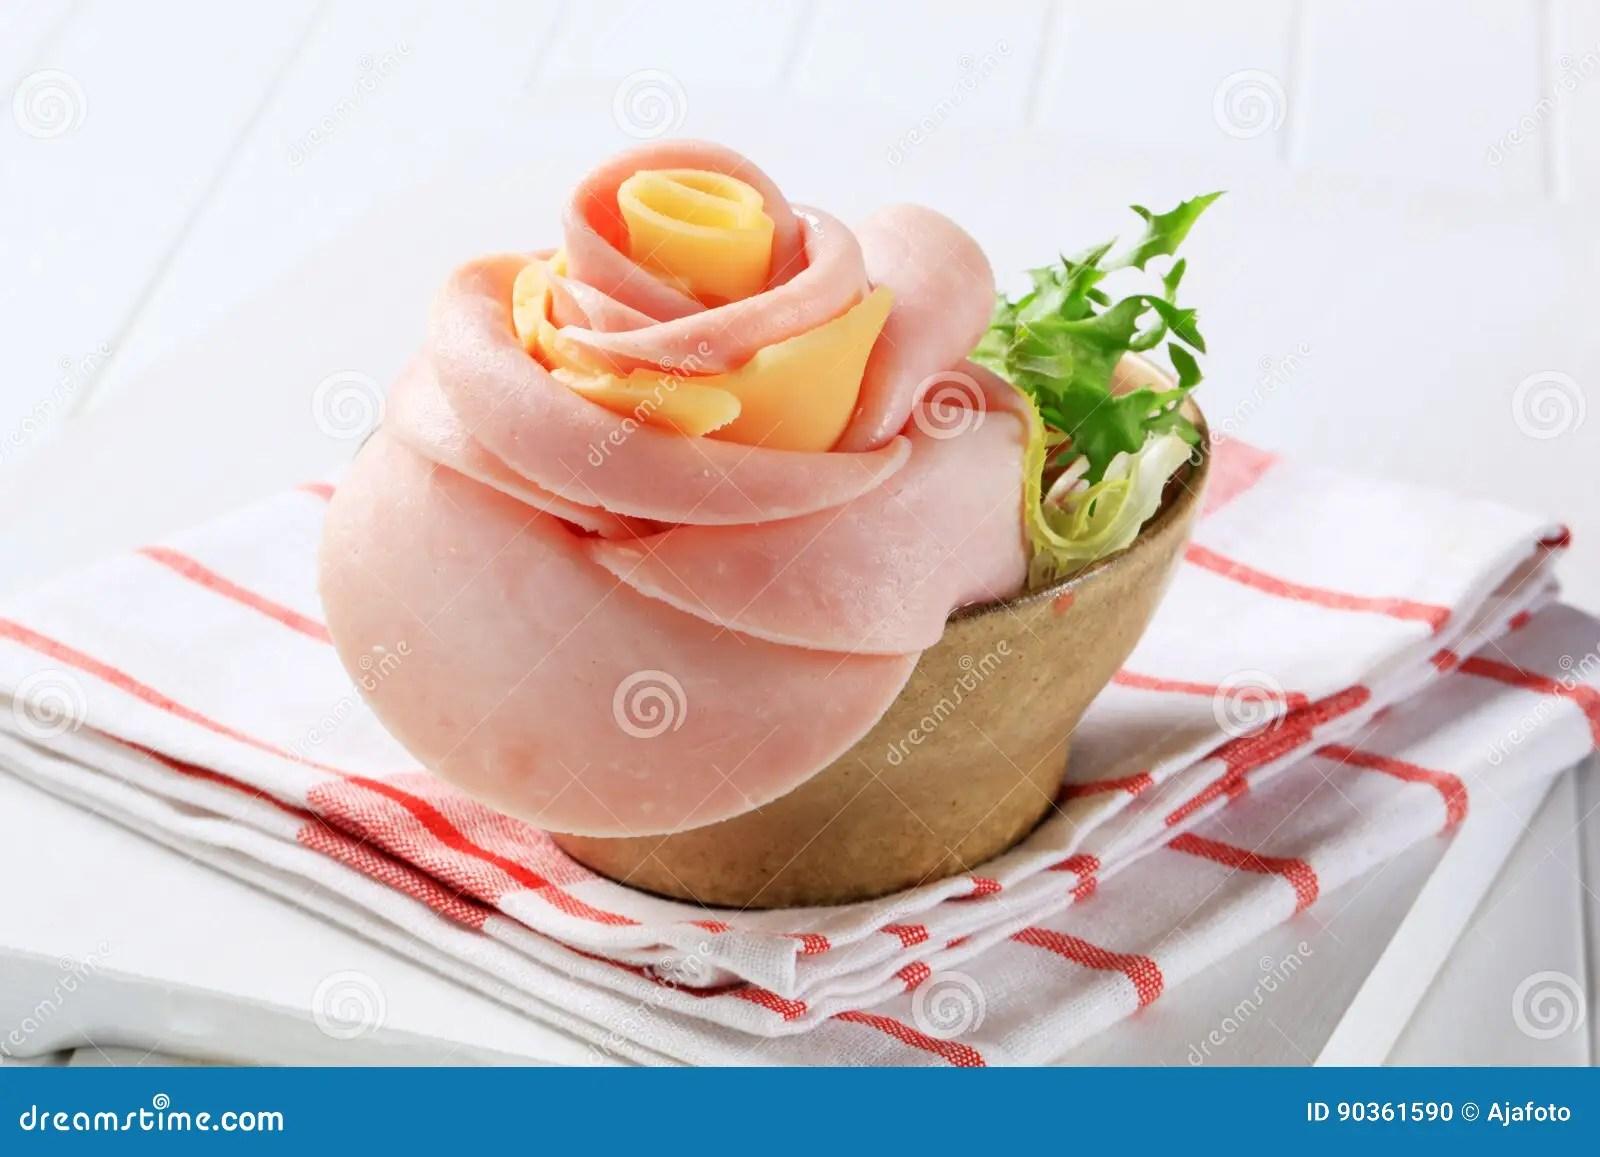 ham and cheese rose